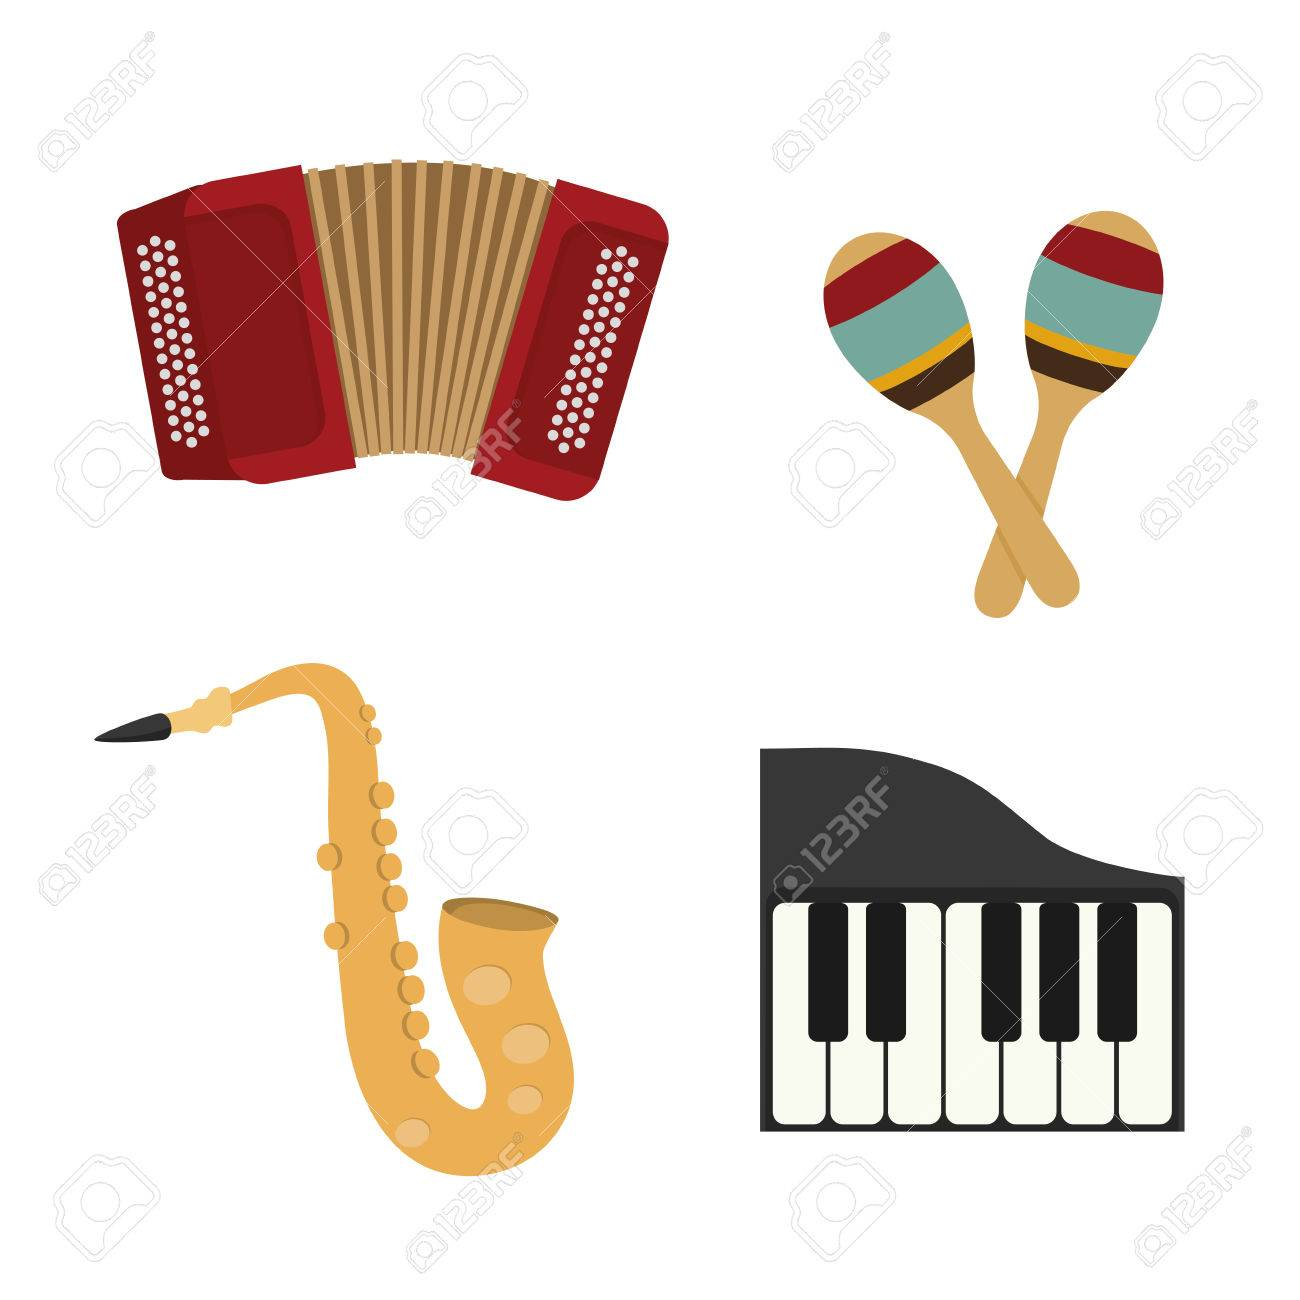 Music instrument concept represented by accordion,piano, maraca